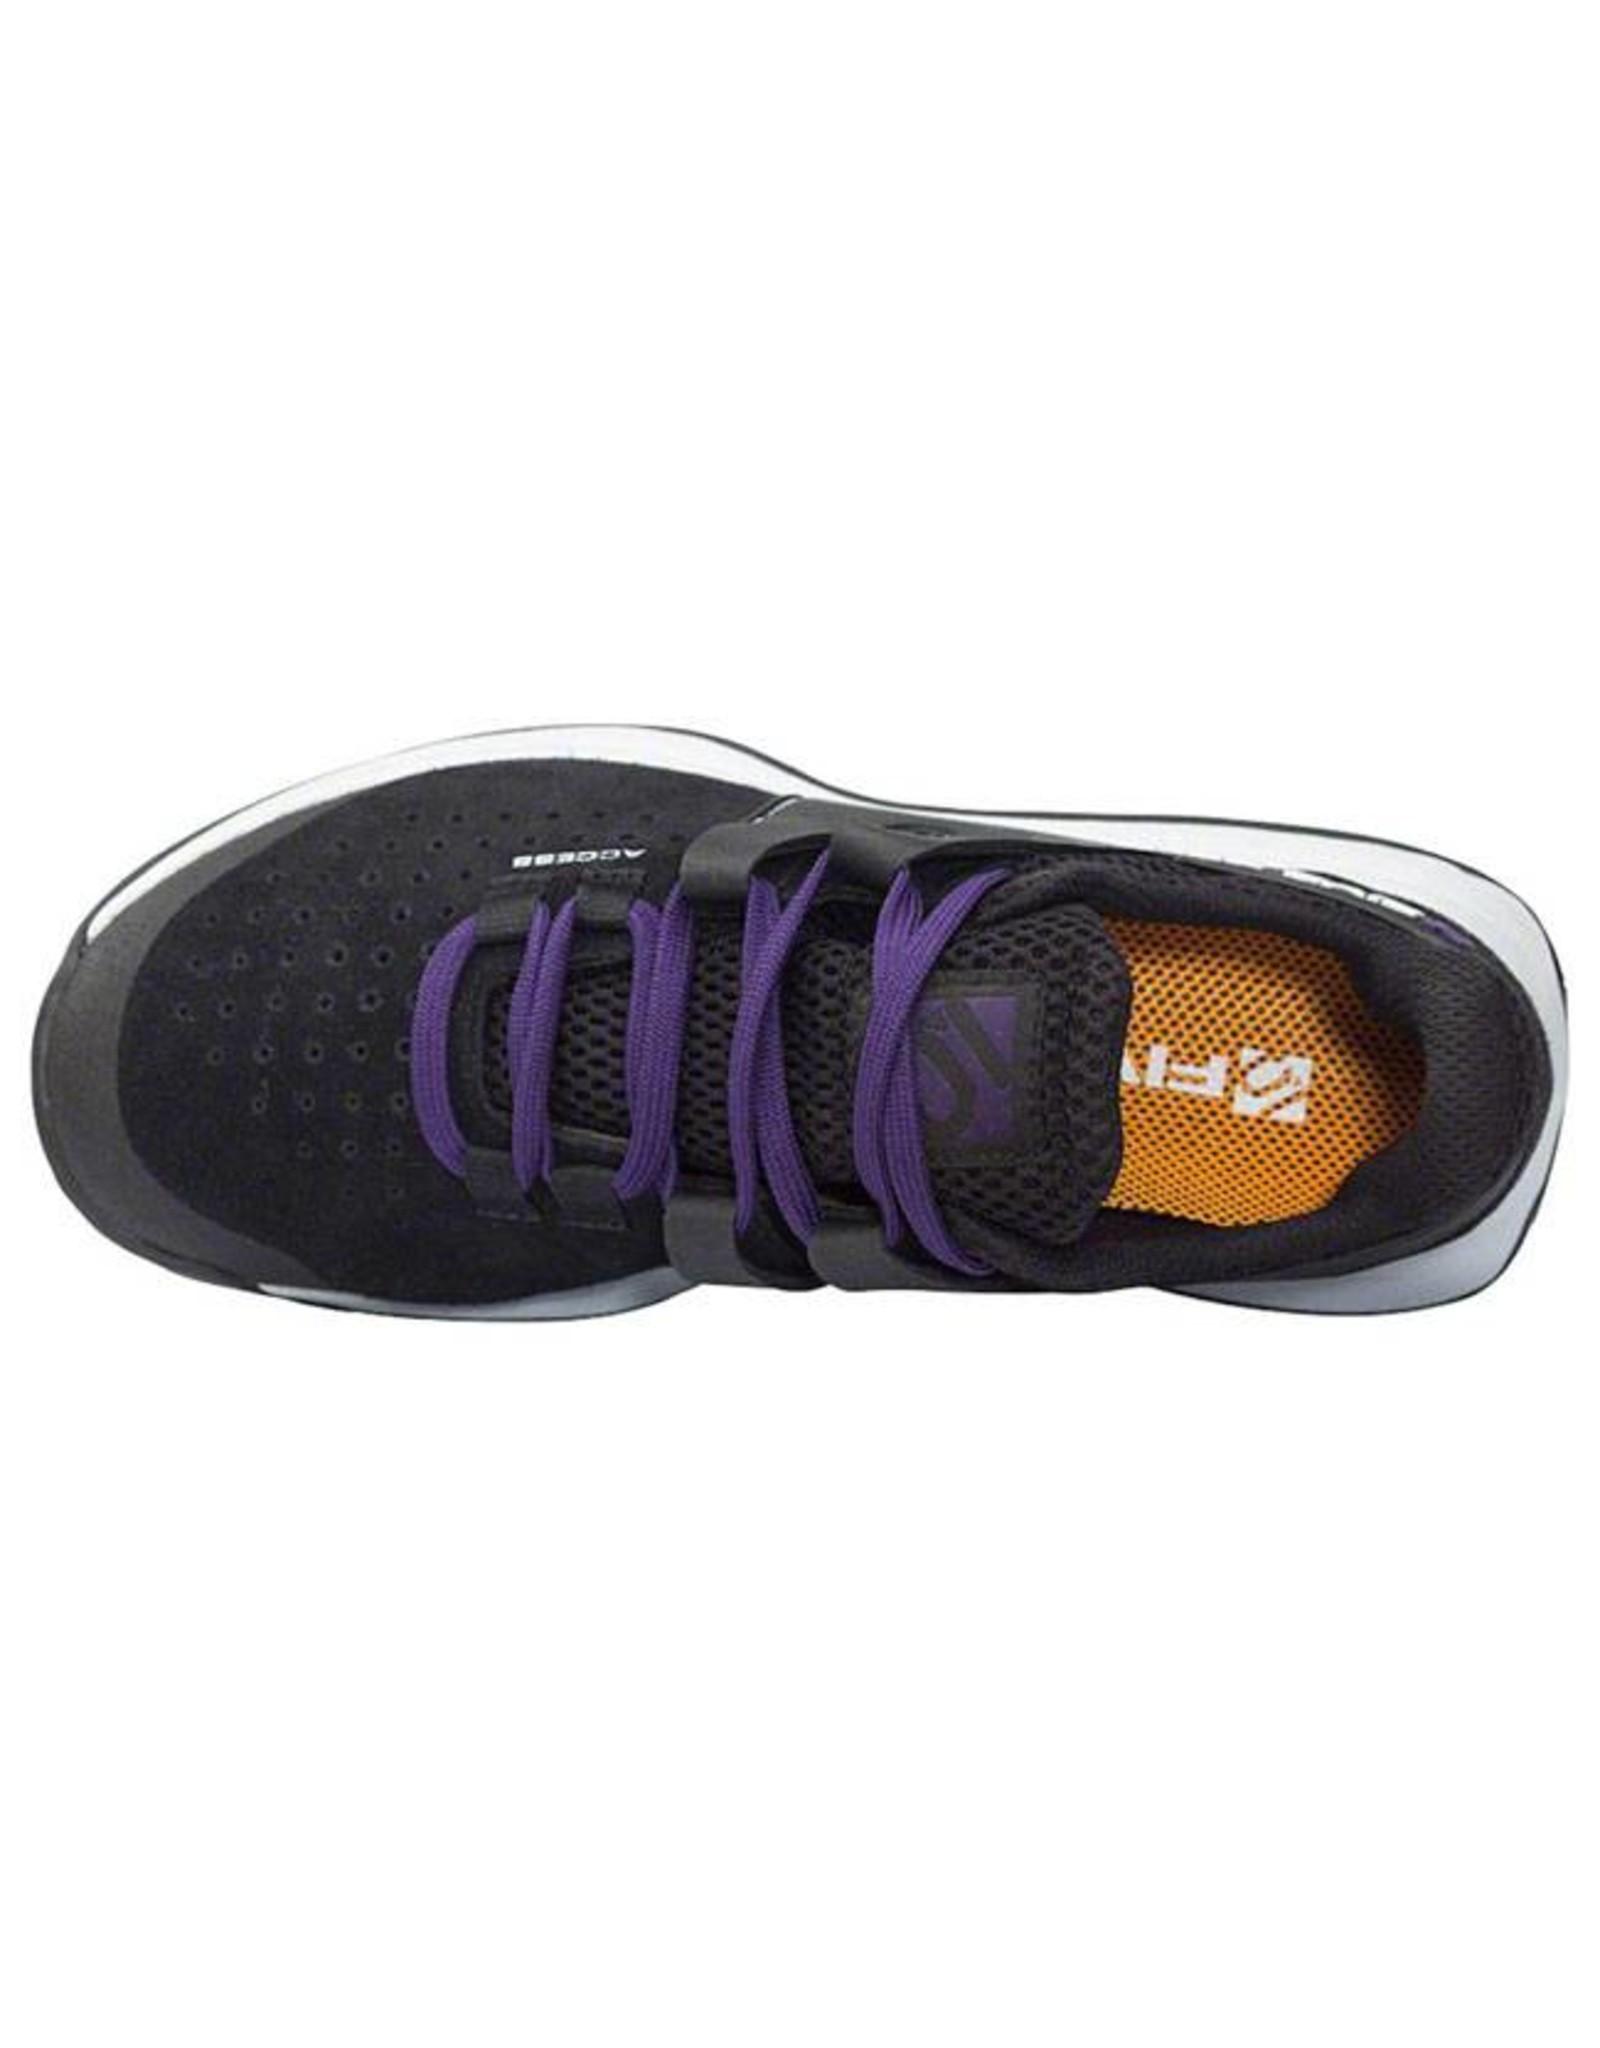 Five Ten Five Ten Access Women's Approach Shoe: Gray 8